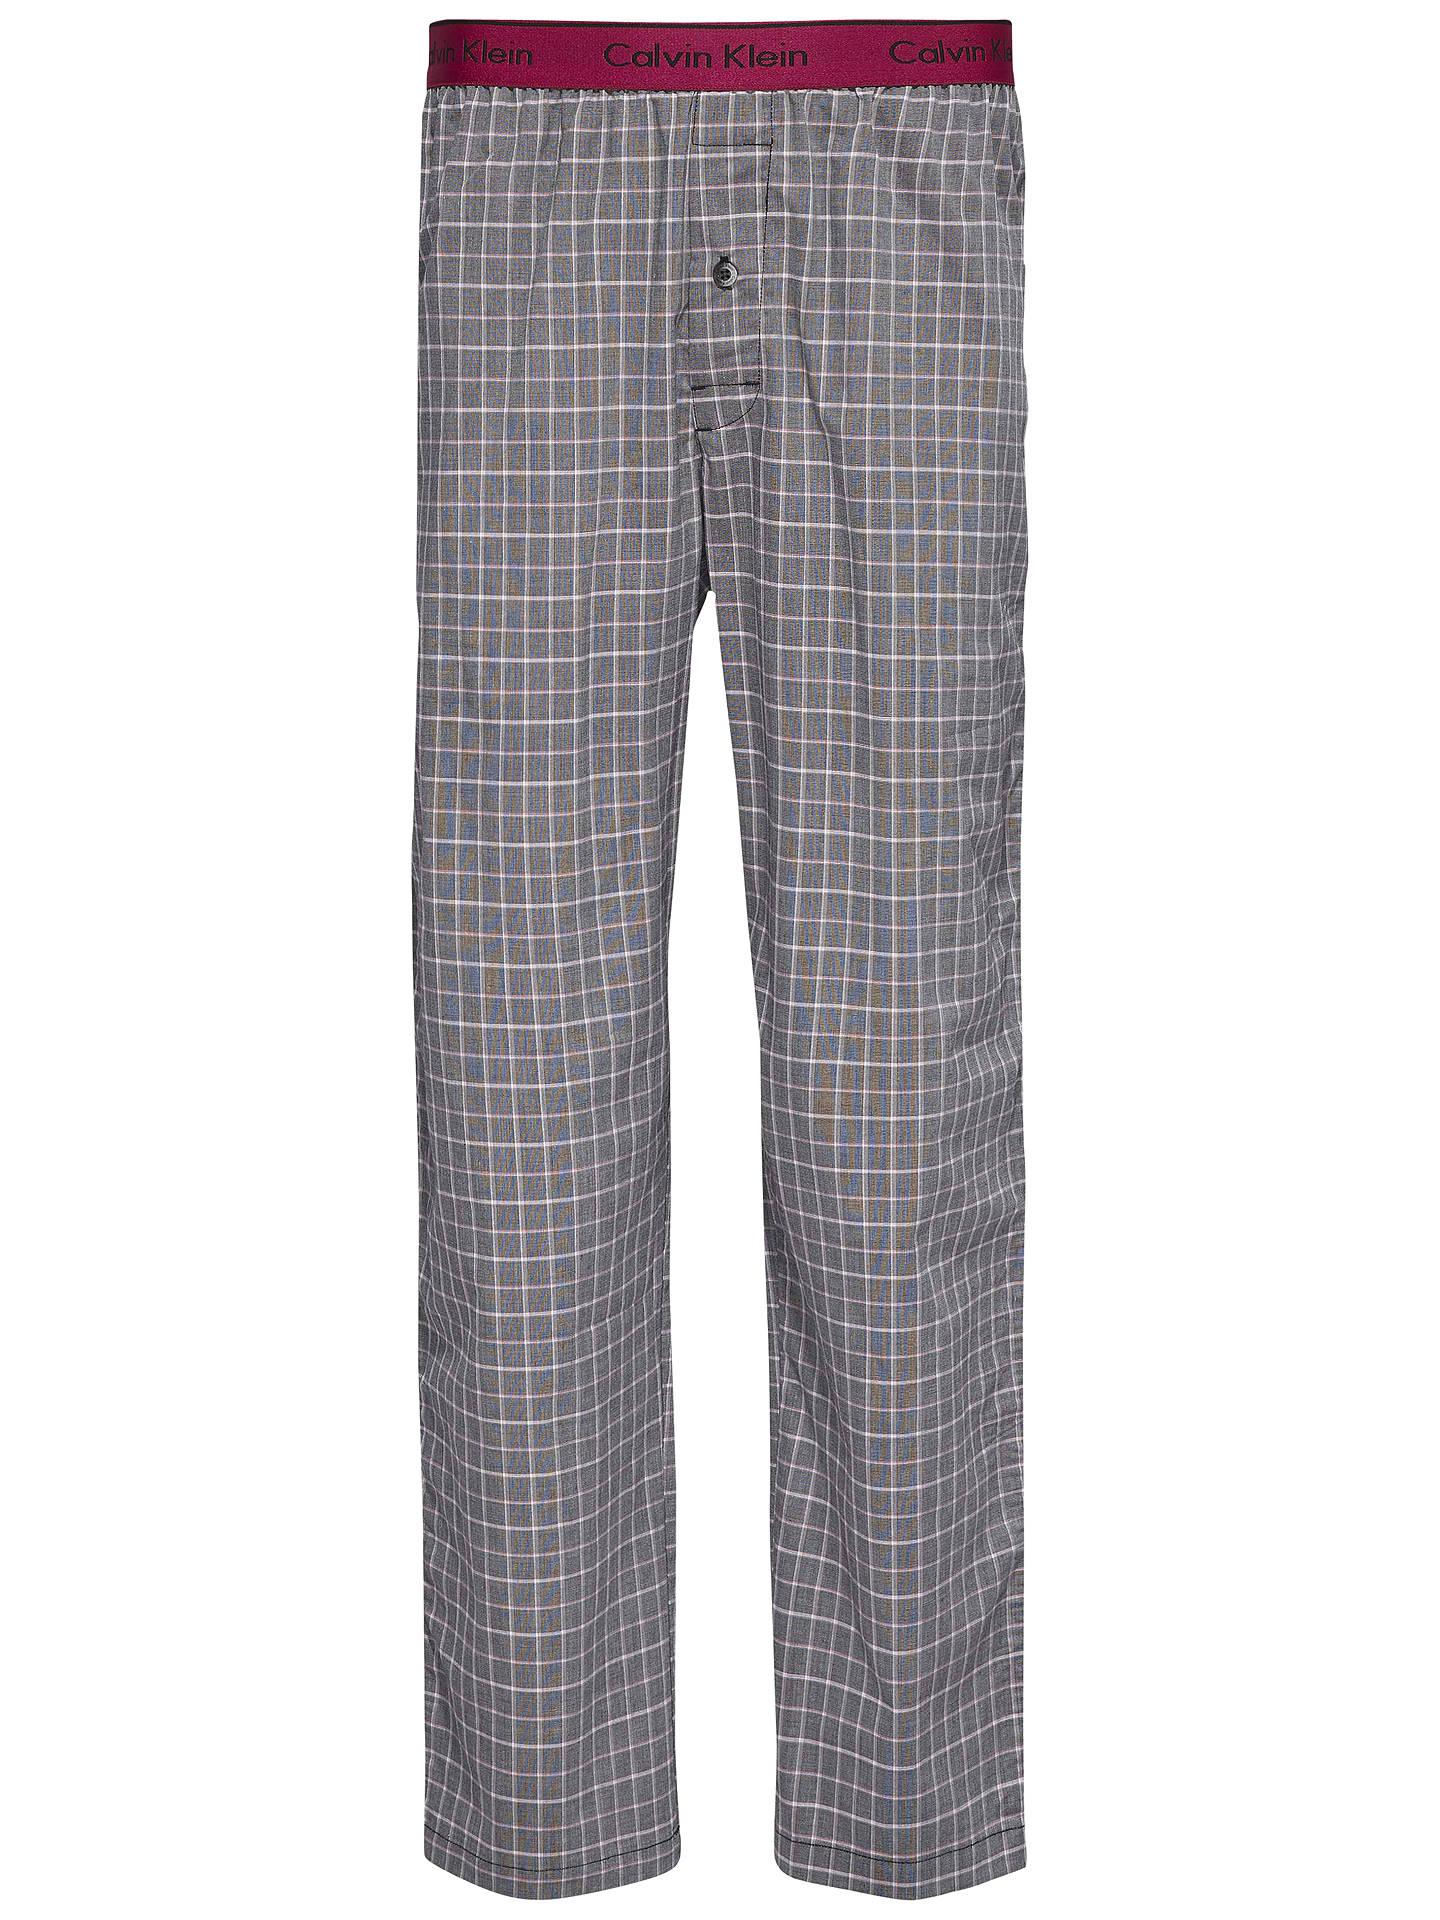 e6baf36fa5f Buy Calvin Klein Woven Cotton Check Lounge Pants